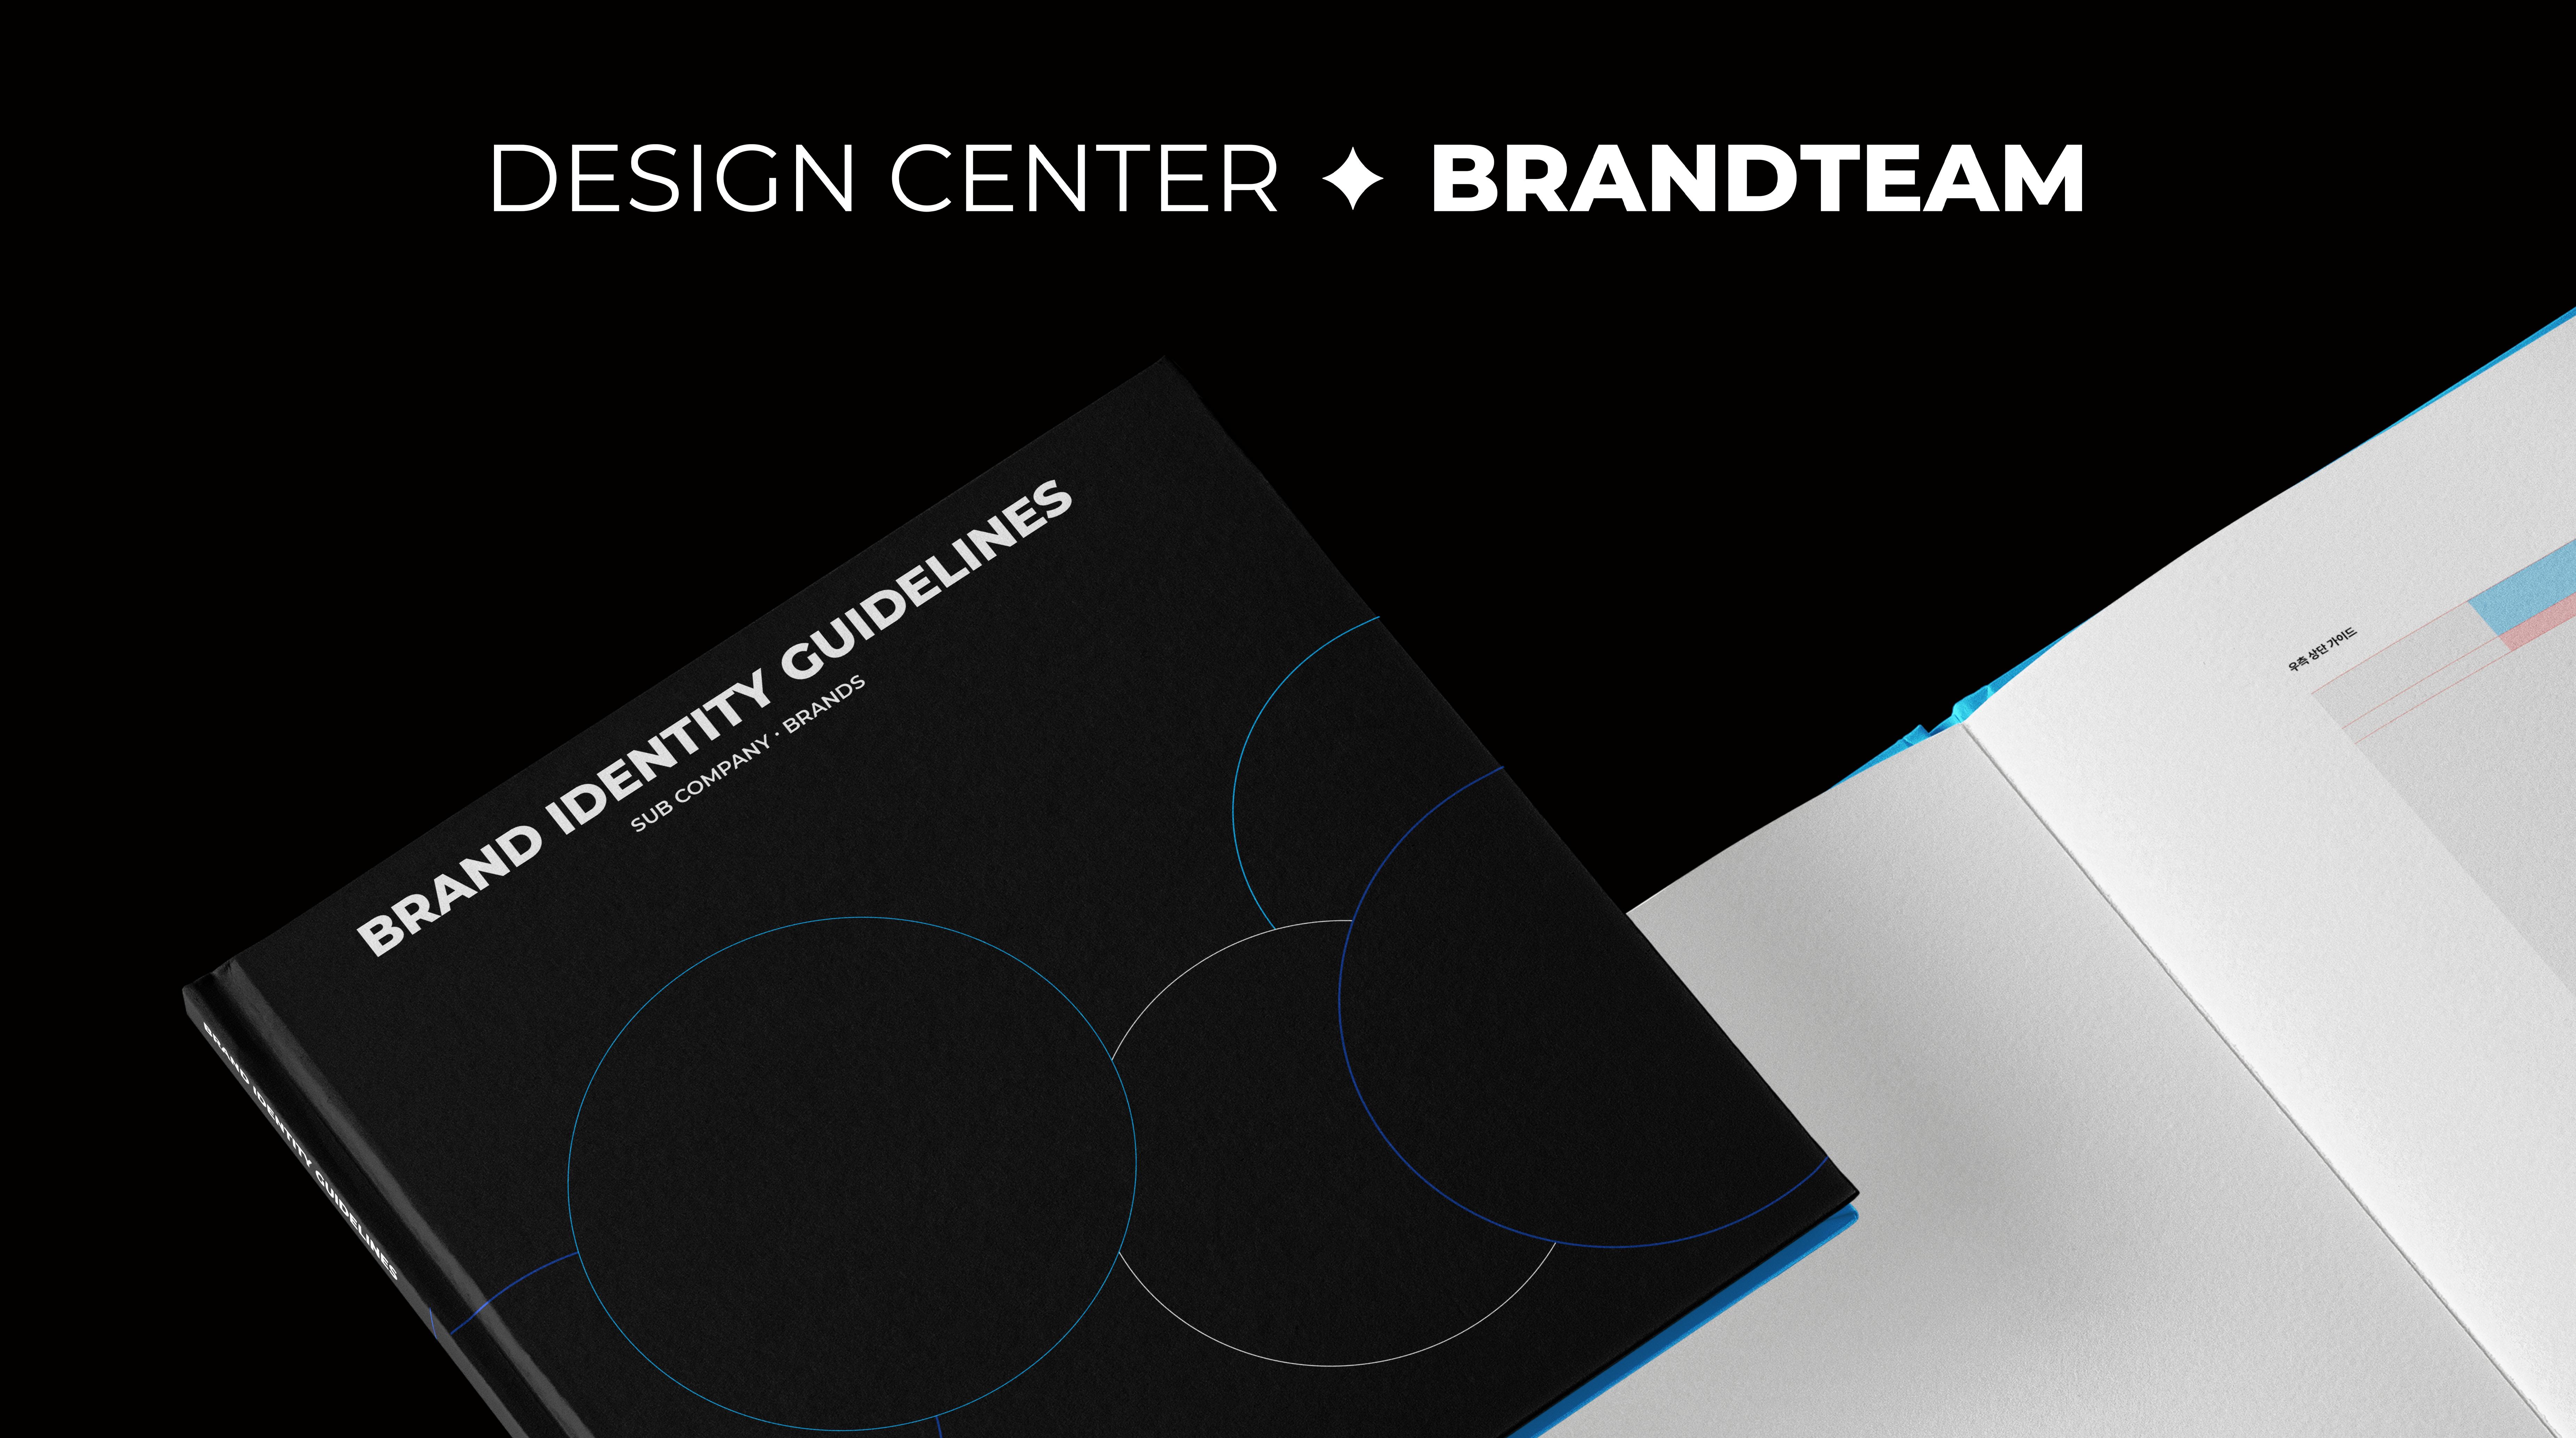 [Y스토리] YTN 계열사 브랜드 아이덴티티 개선